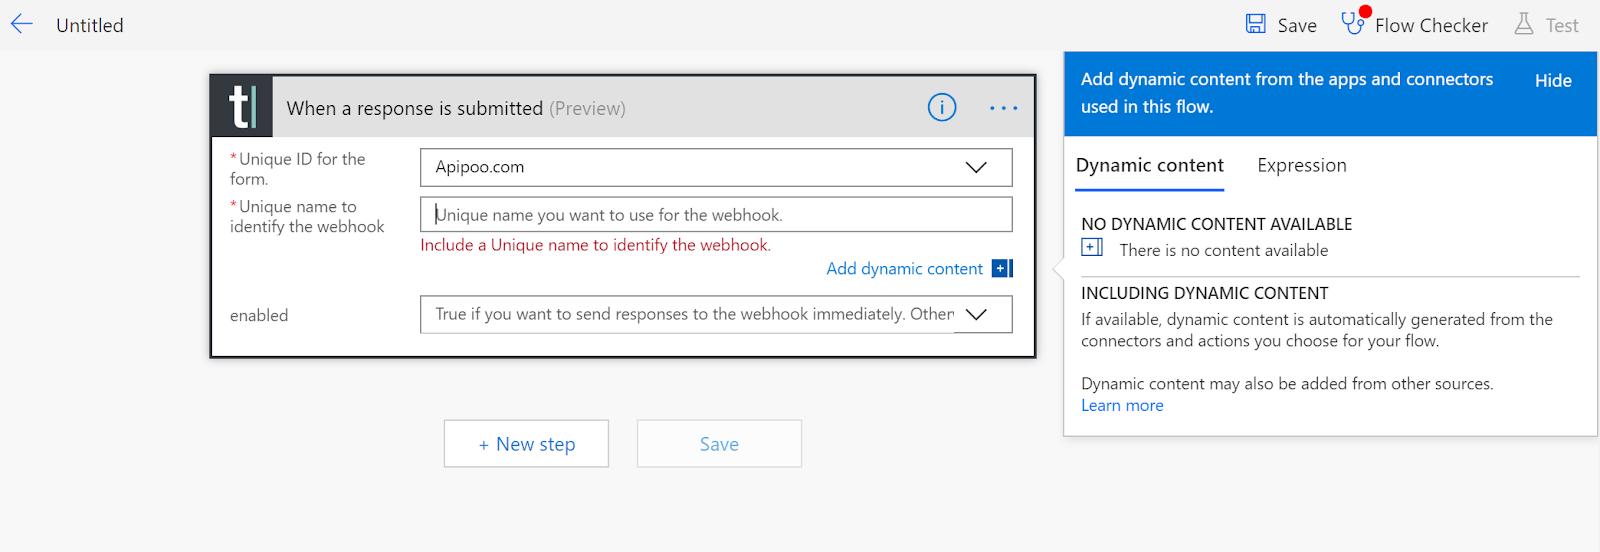 Microsoft Flow typeform screenshot